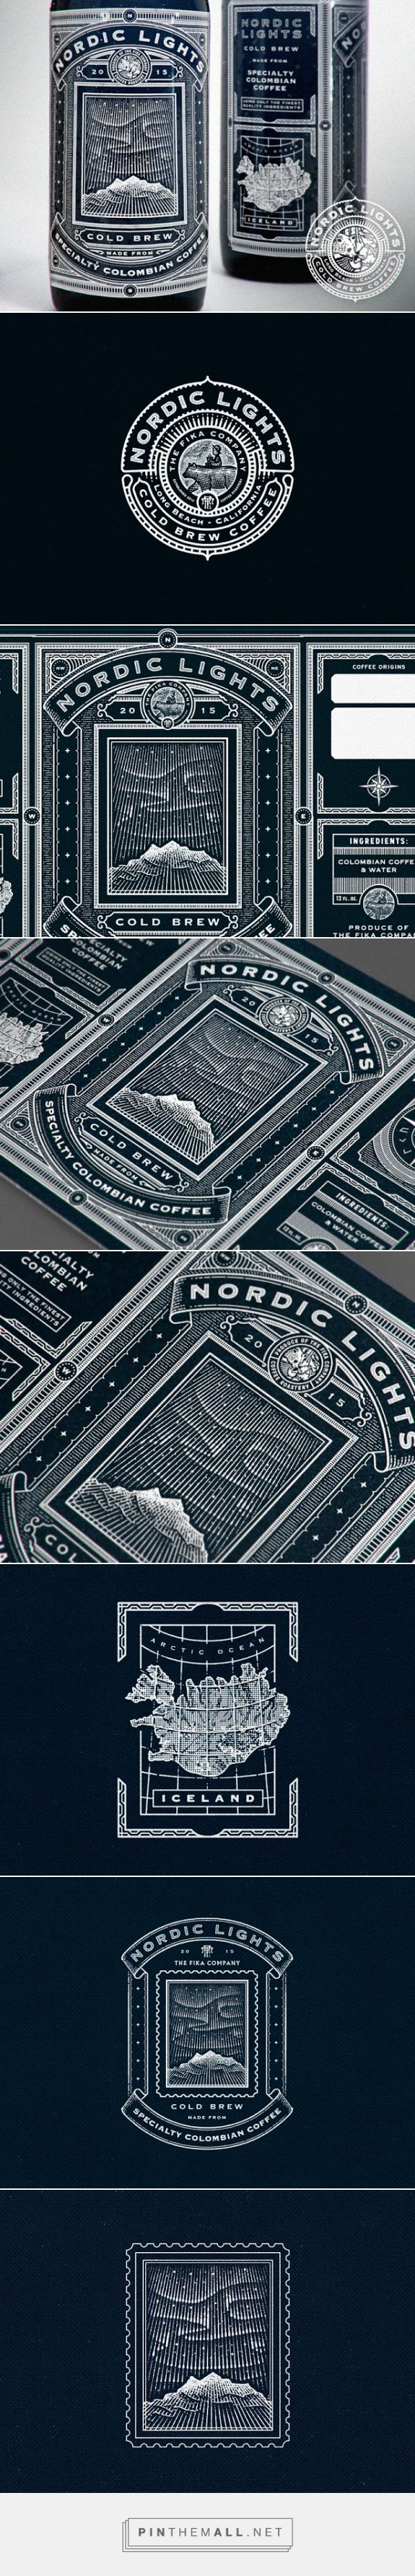 Nordic Lights Coffee packaging designed by Ye Olde Studio - http://www.packagingoftheworld.com/2016/01/nordic-lights.html - created via https://pinthemall.net